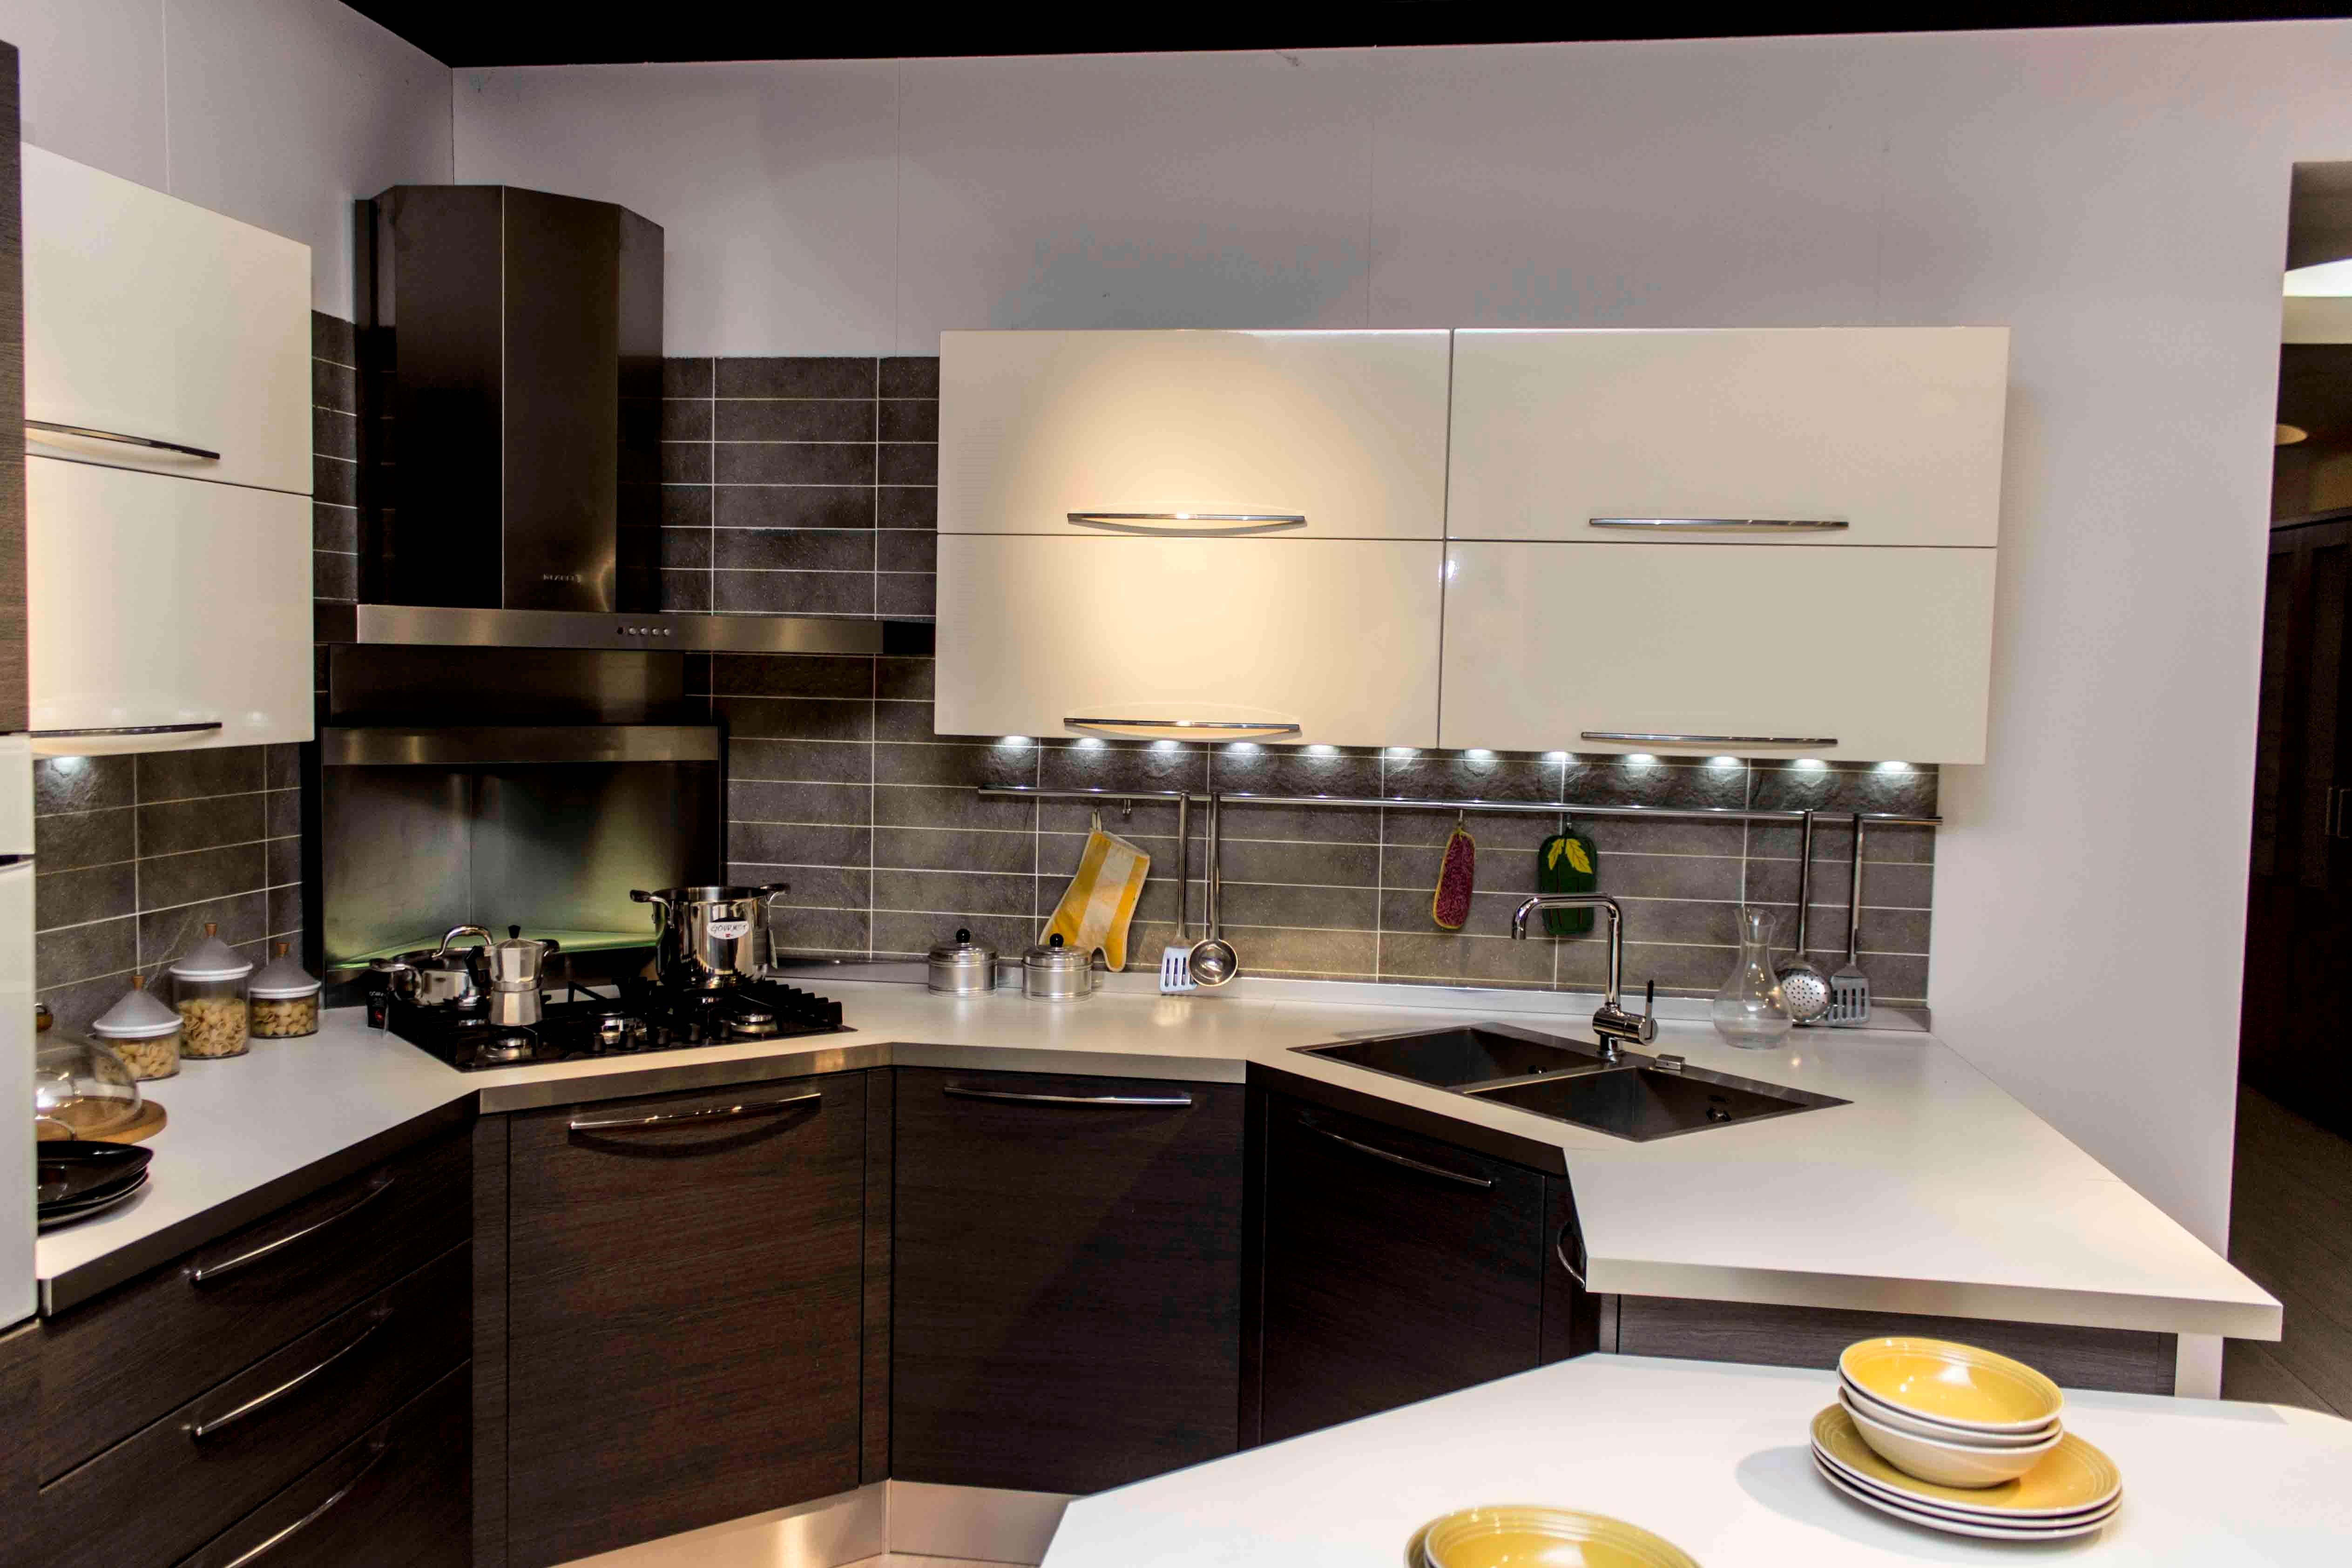 Veneta cucine cucina carrera esasystem scontato del 50 - Carrelli estraibili per cucine ...